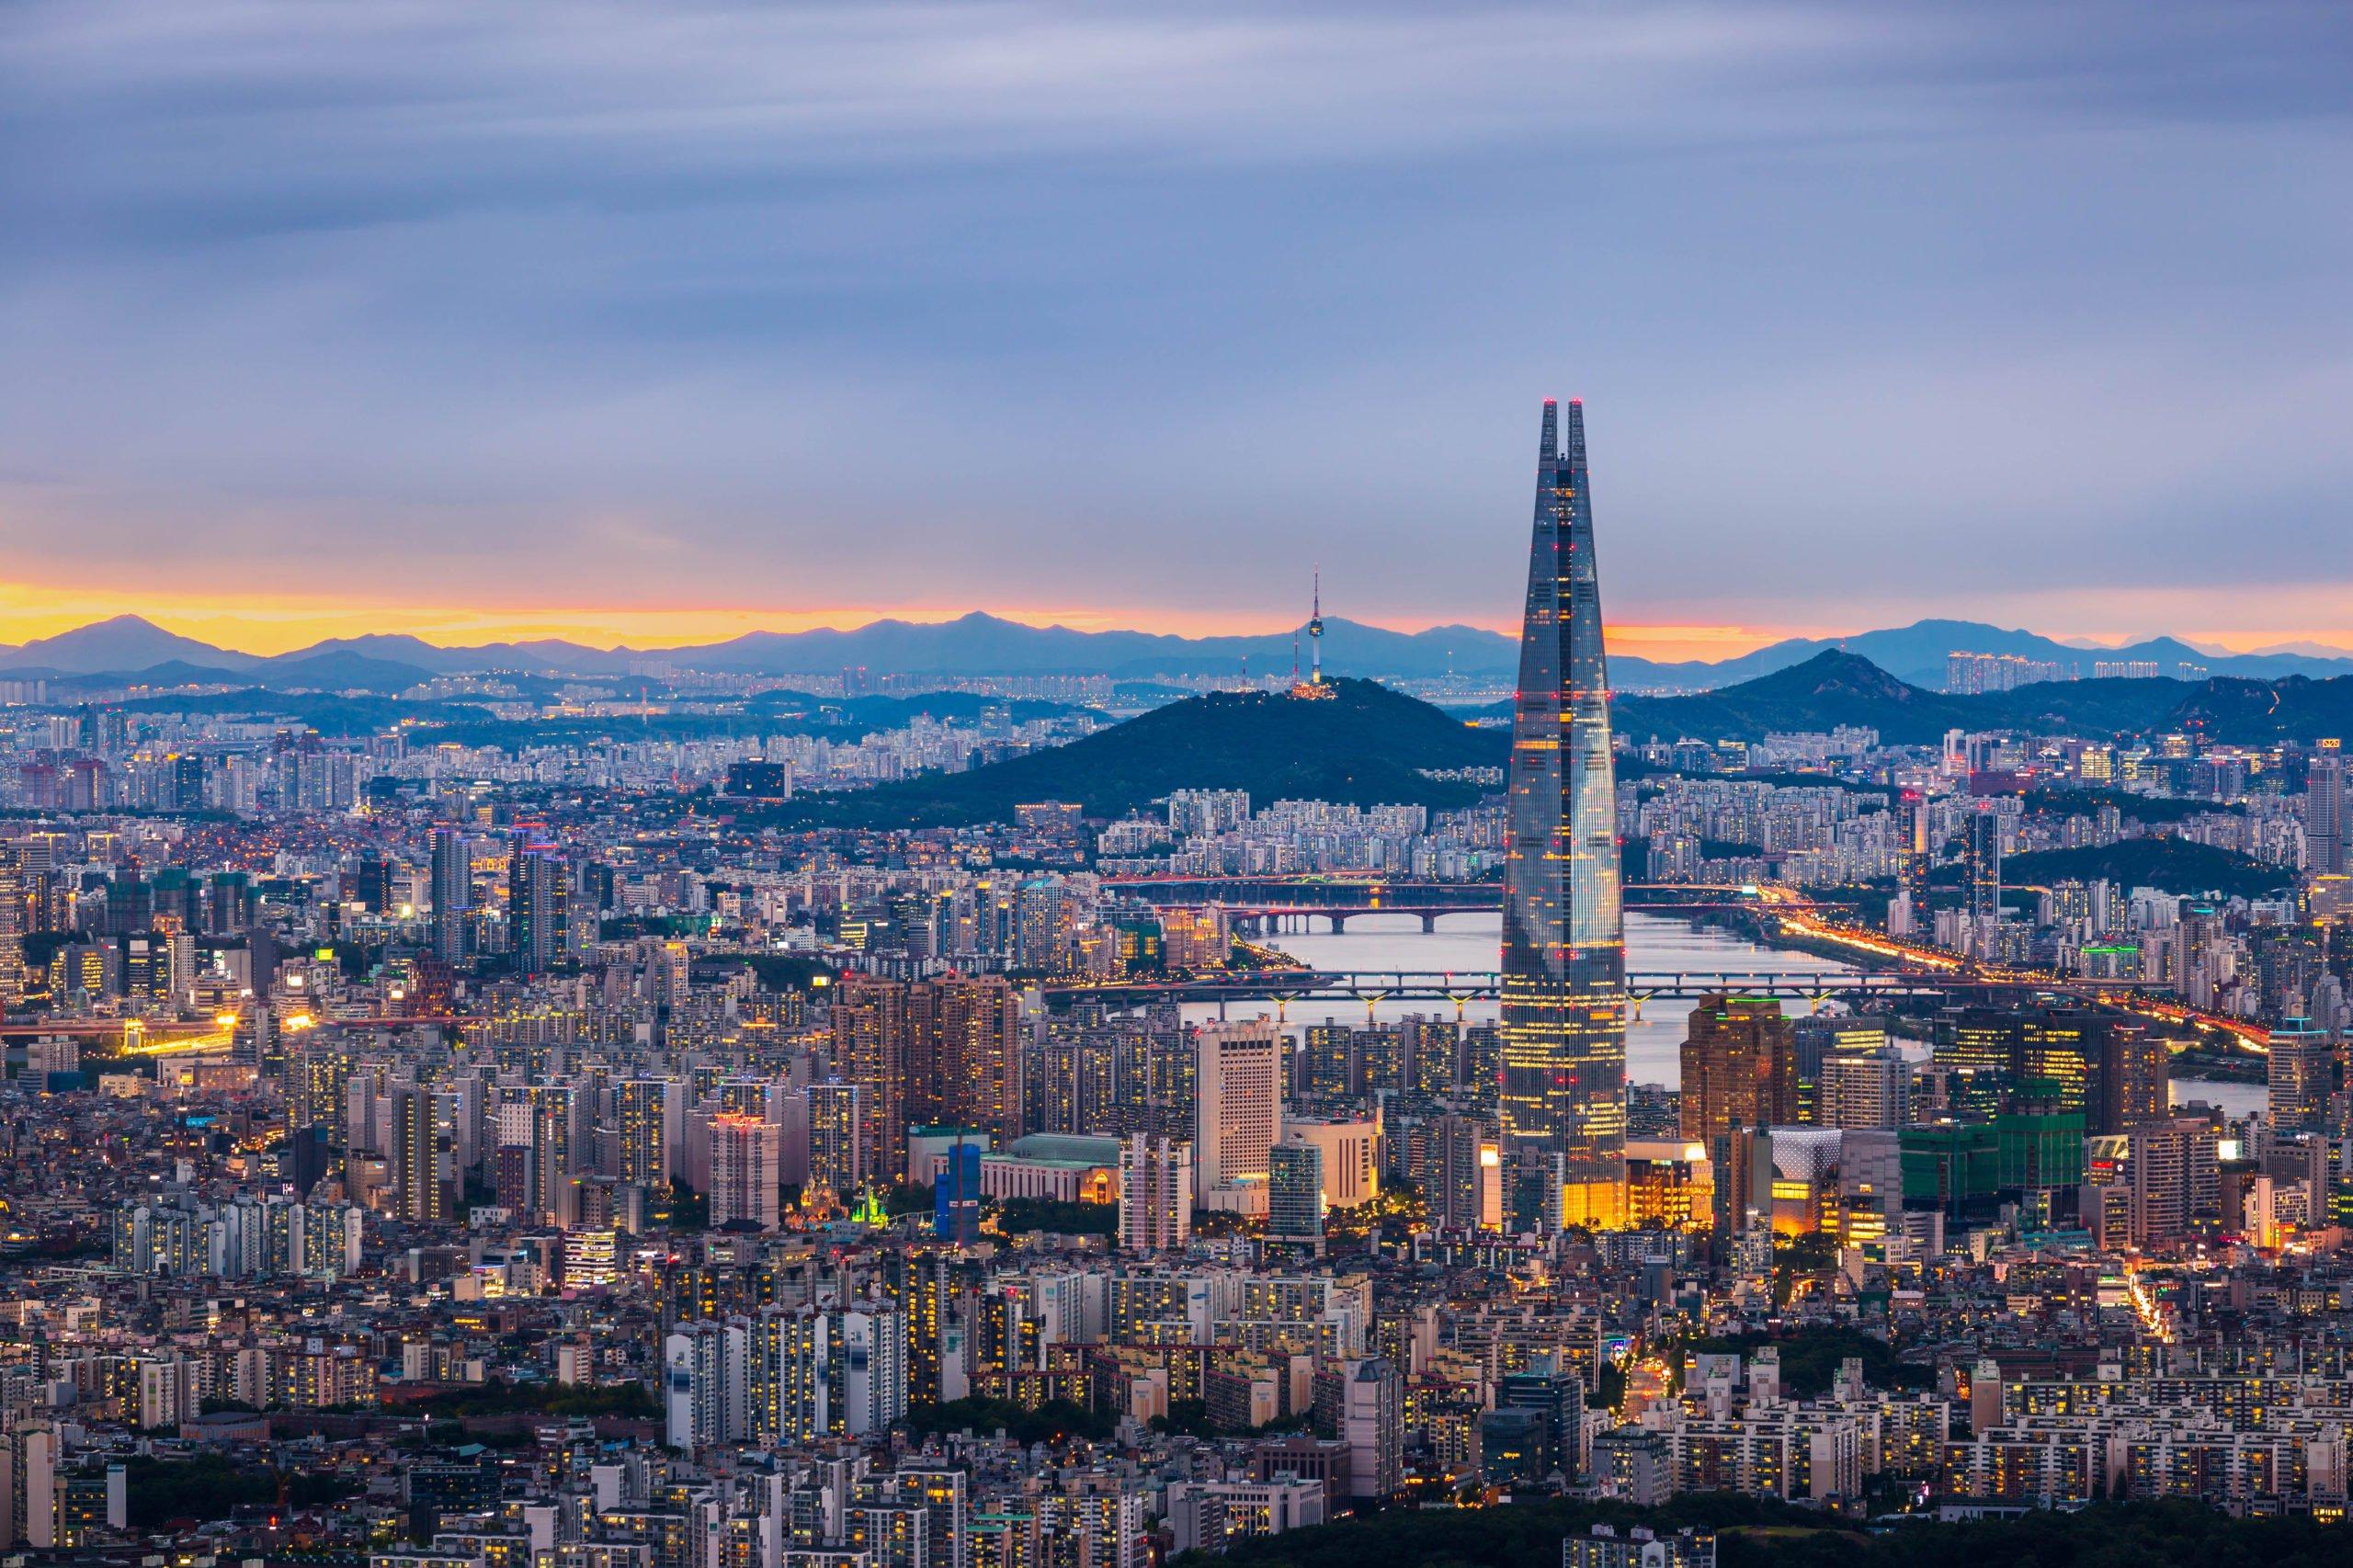 ASEM-DUO Korea Fellowship Programme 2021: Open Call for Applications!